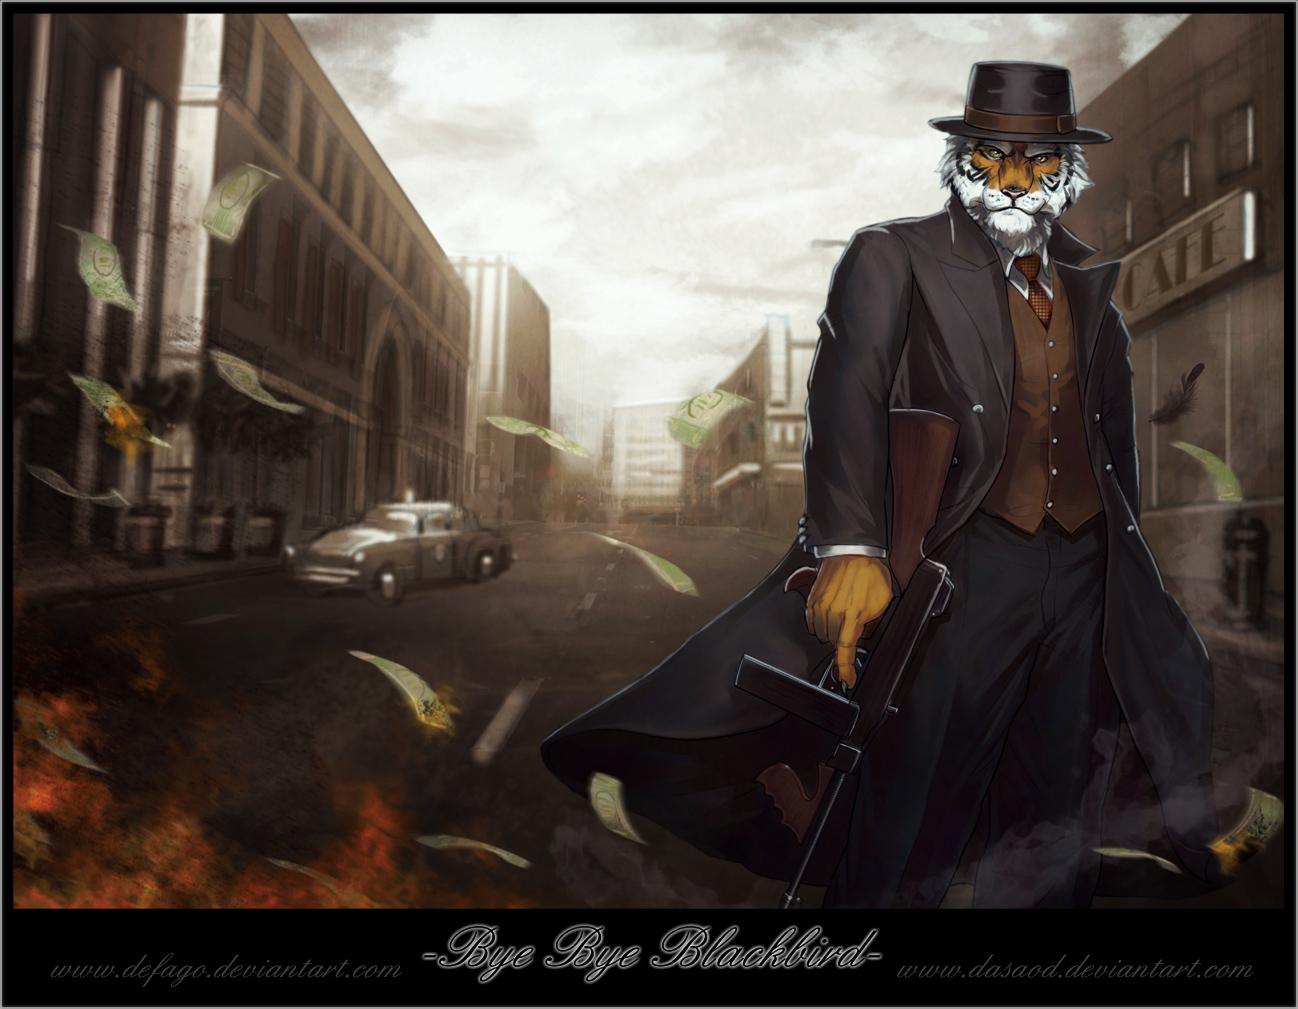 Bye Bye Blackbird by Defago